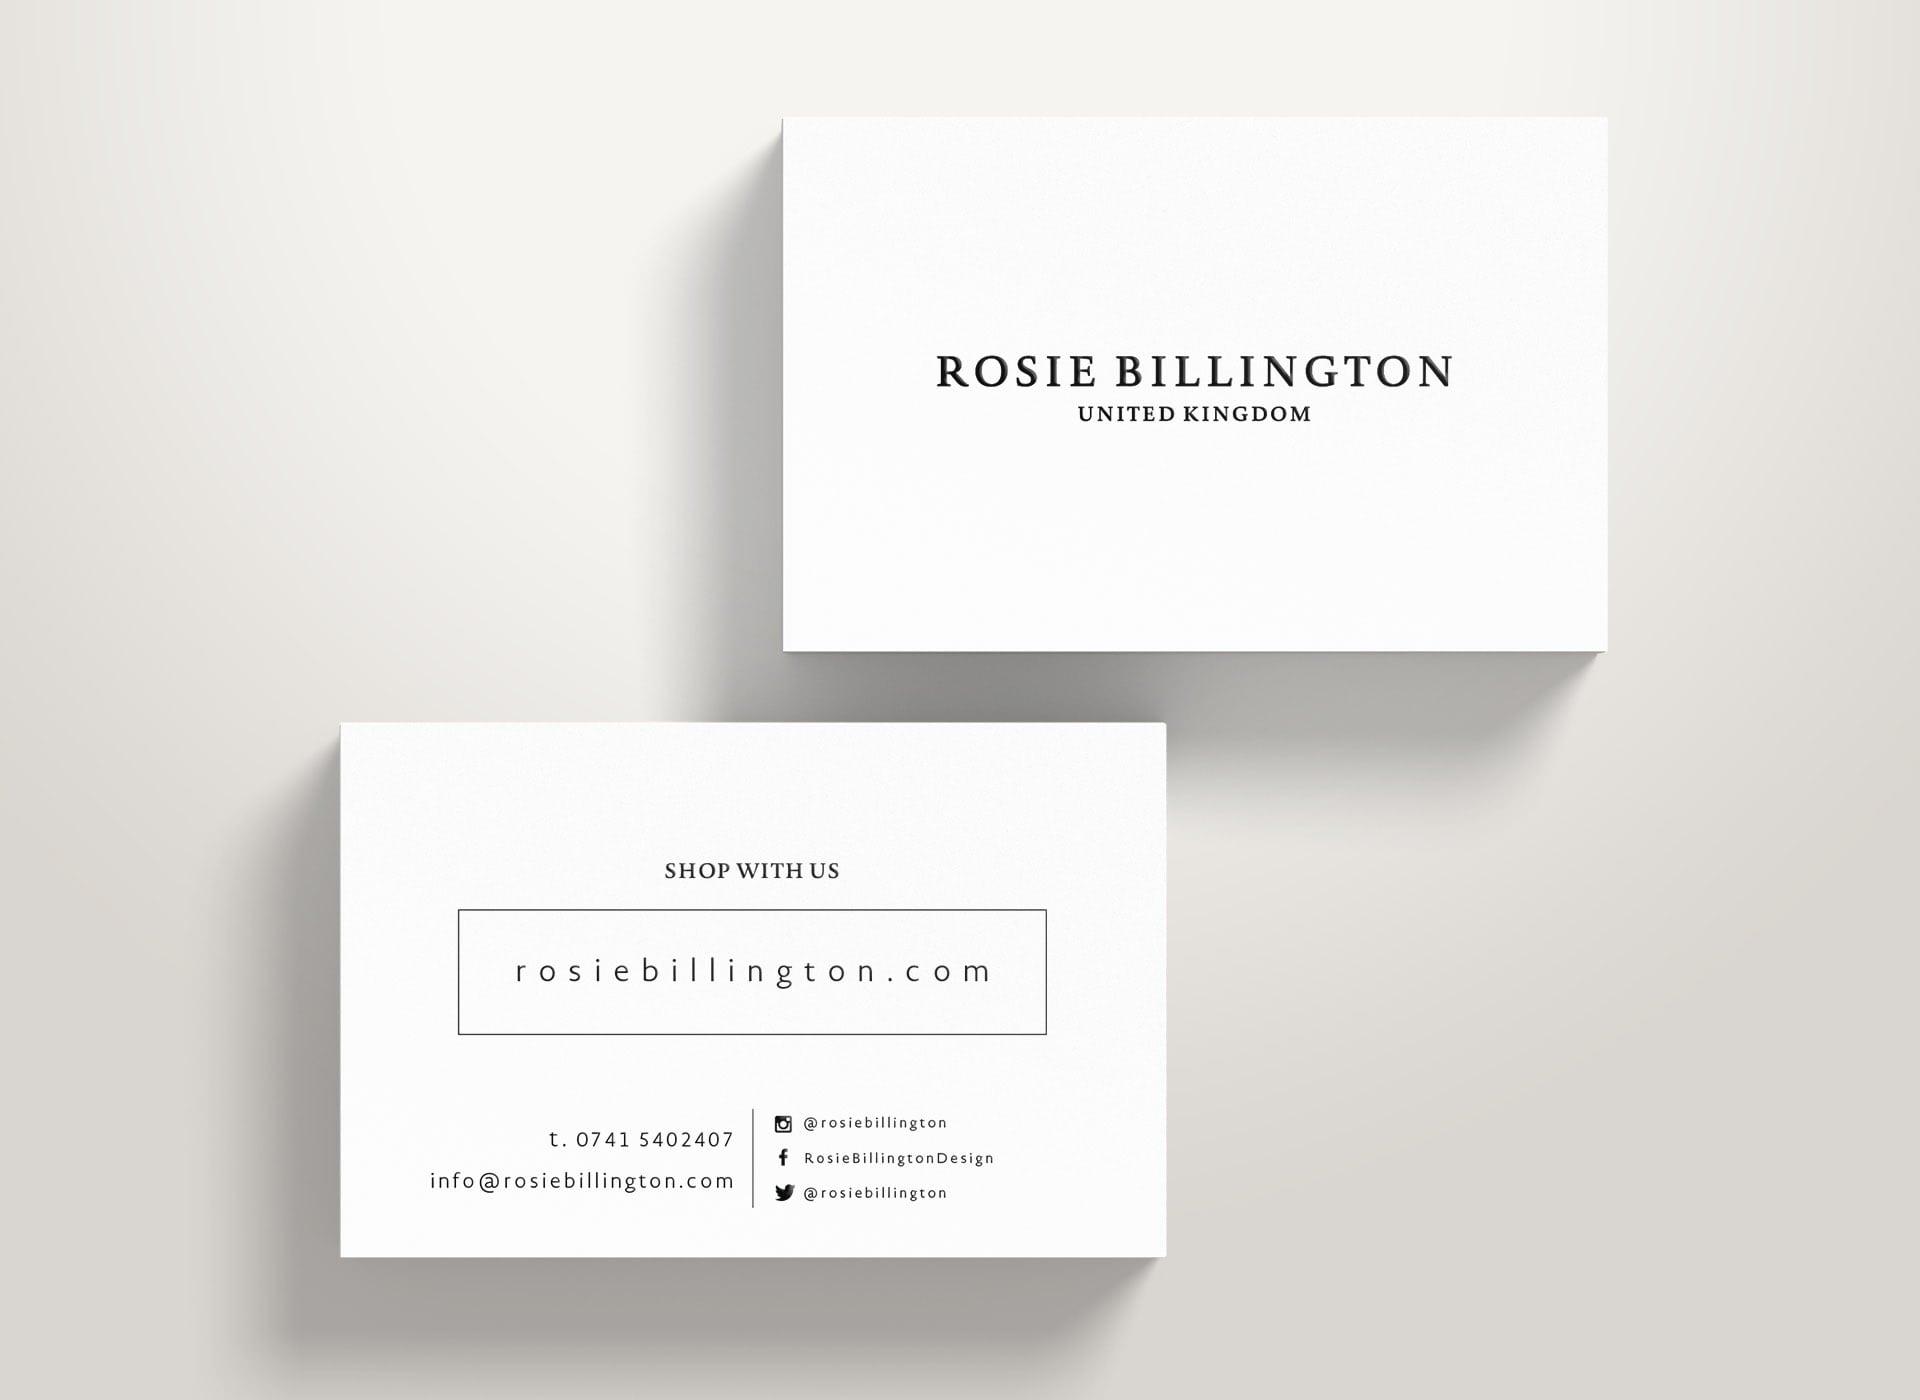 saint loupe, digital agency birmingham, creative studio uk, content production, web agency, marketing agency birmingham, business card design and printing, business card birmingham